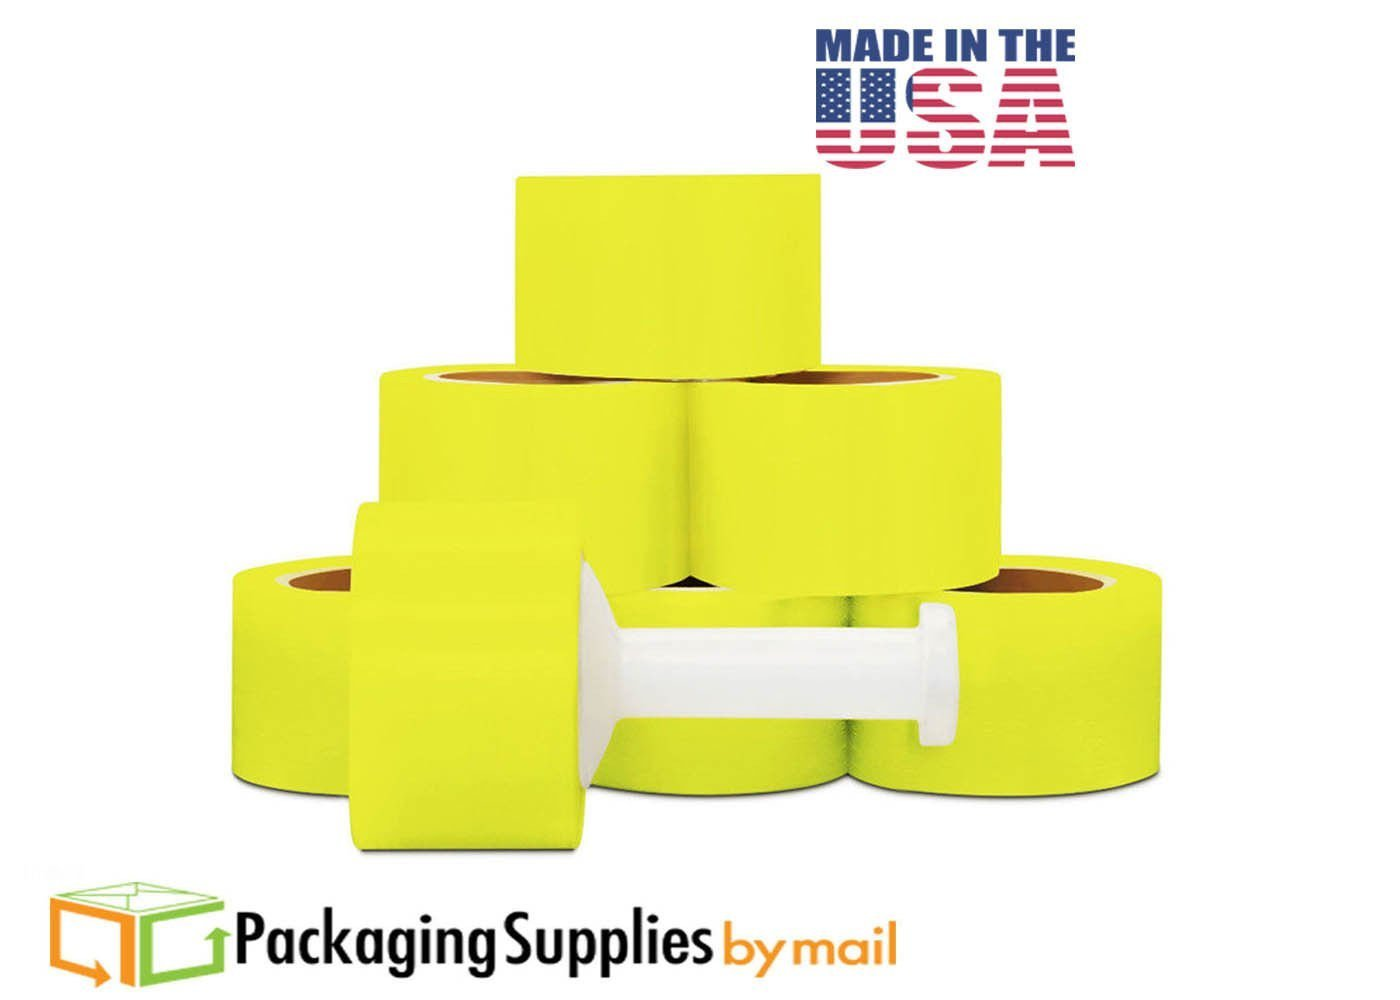 Narrow Banding Yellow Stretch Film Hand Wrap 3 Inch x 80 Gauge x 1000 Feet 162-Rolls + 1 Plastic Handle per Case